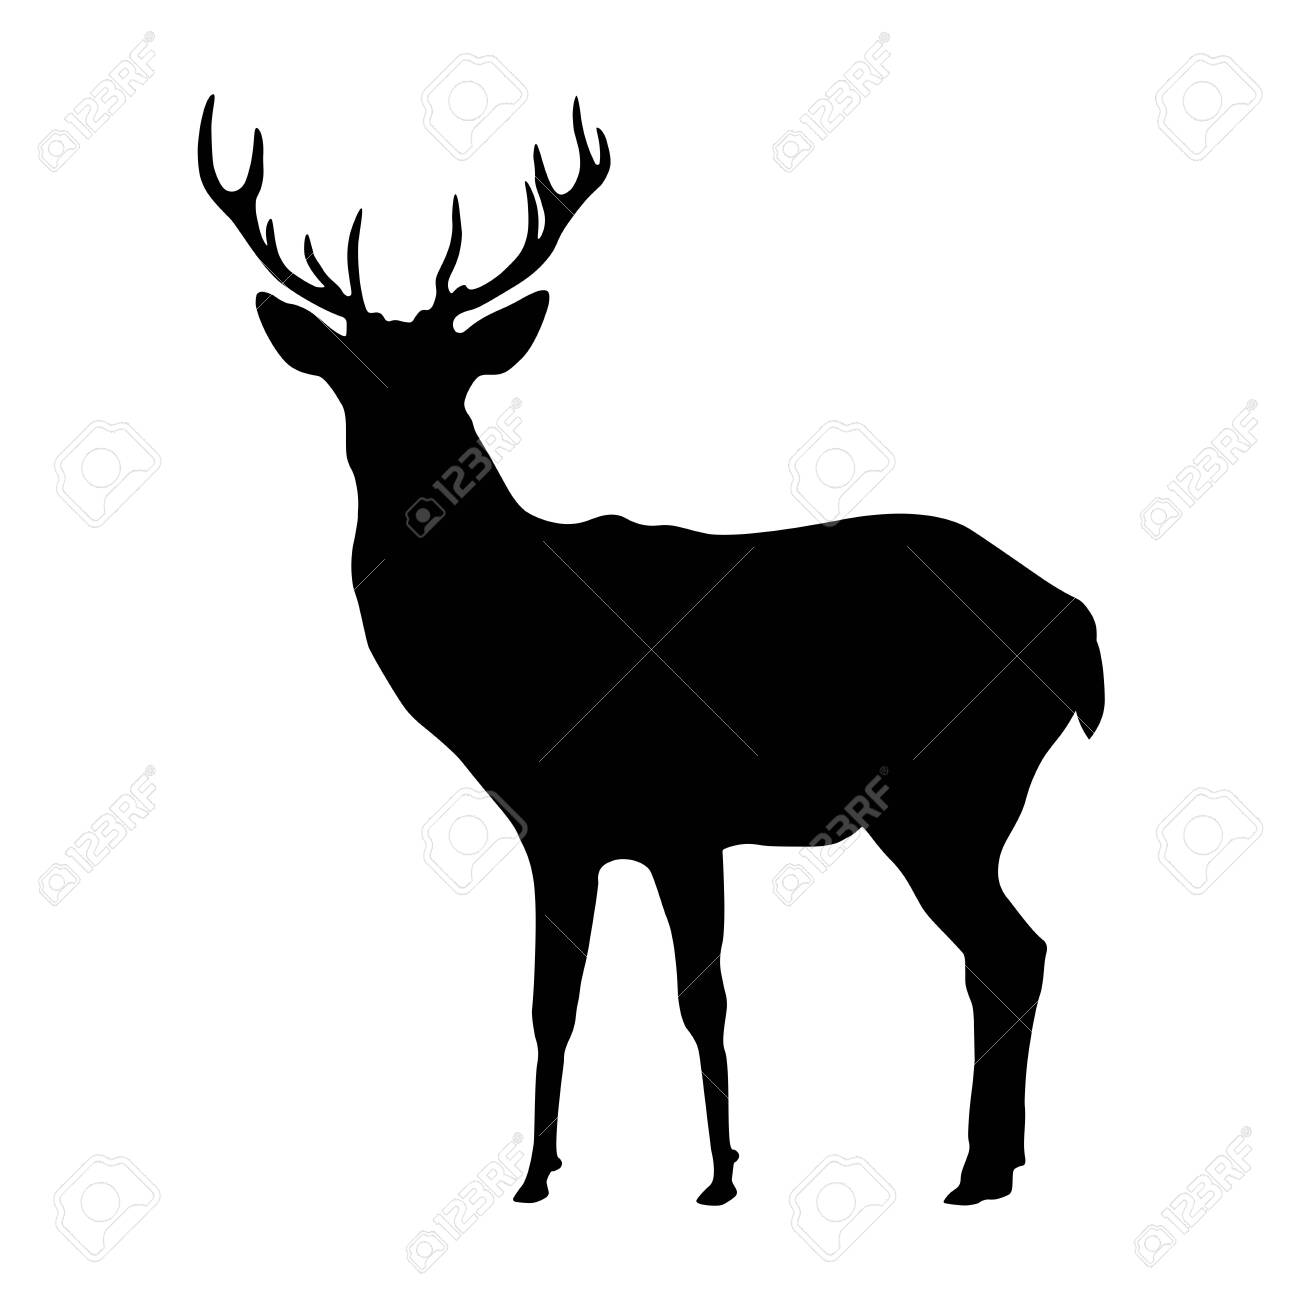 Deer shape, vector design isolated on white background. - 147441810